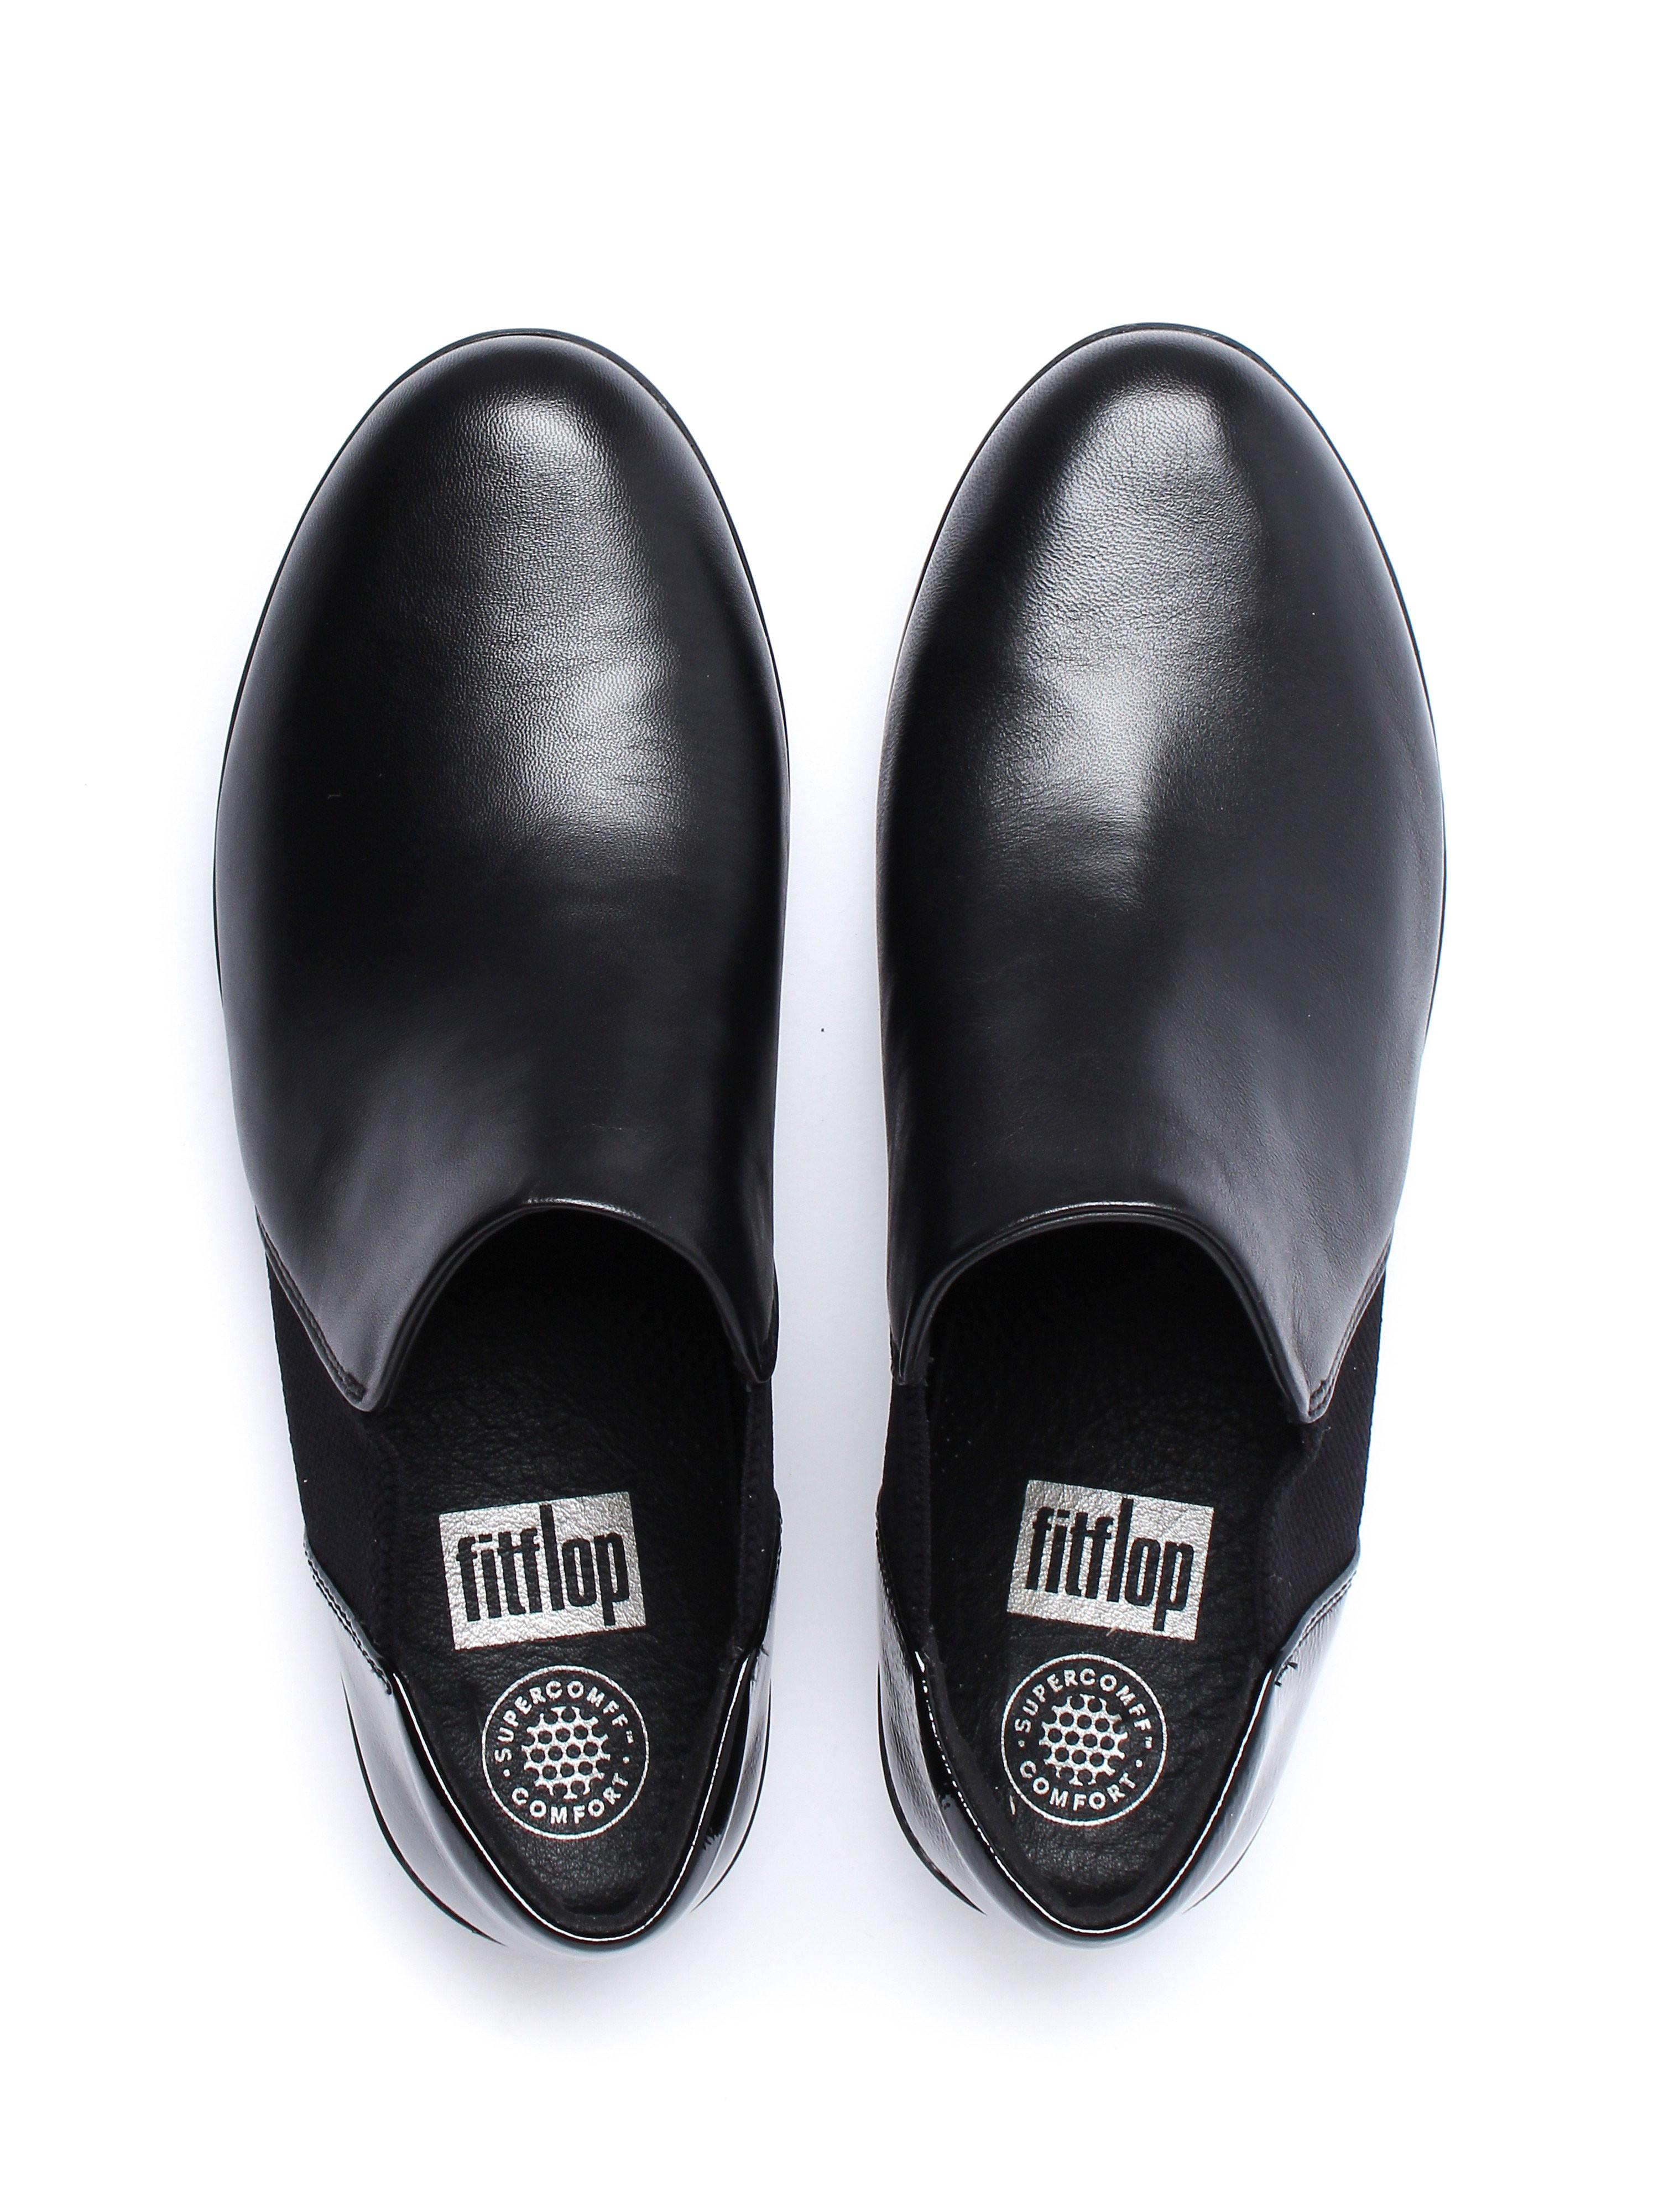 FitFlop Women's Superchelsea Slip On Shoes - Black Leather Patent